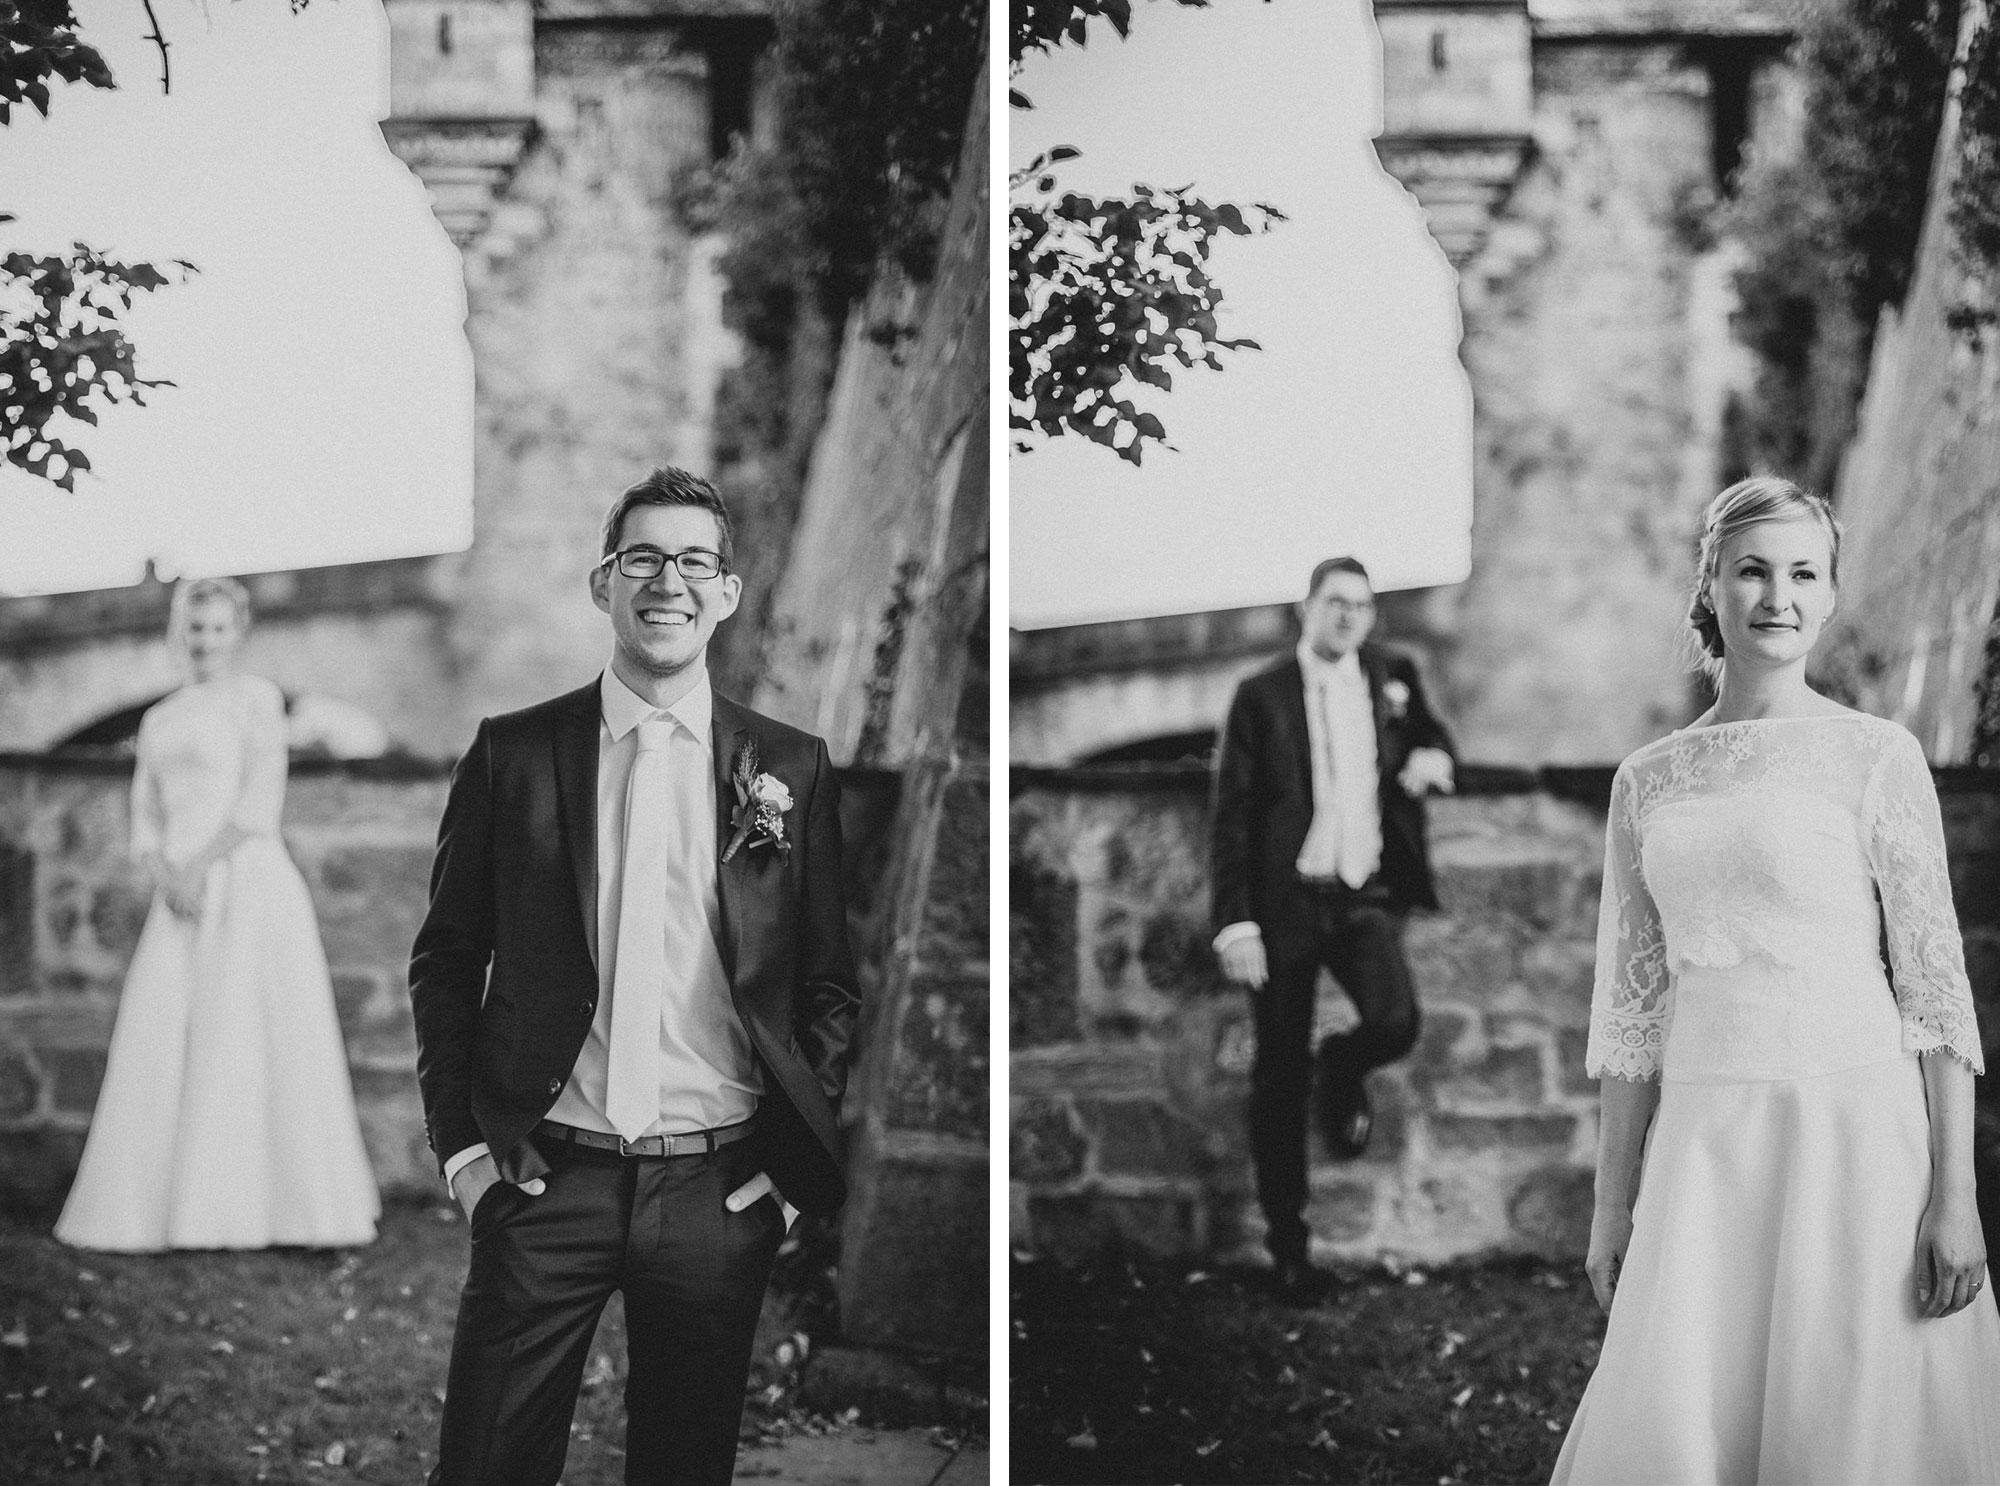 Hochzeitsfotografie-Tuebingen-Doro-Stefan-38